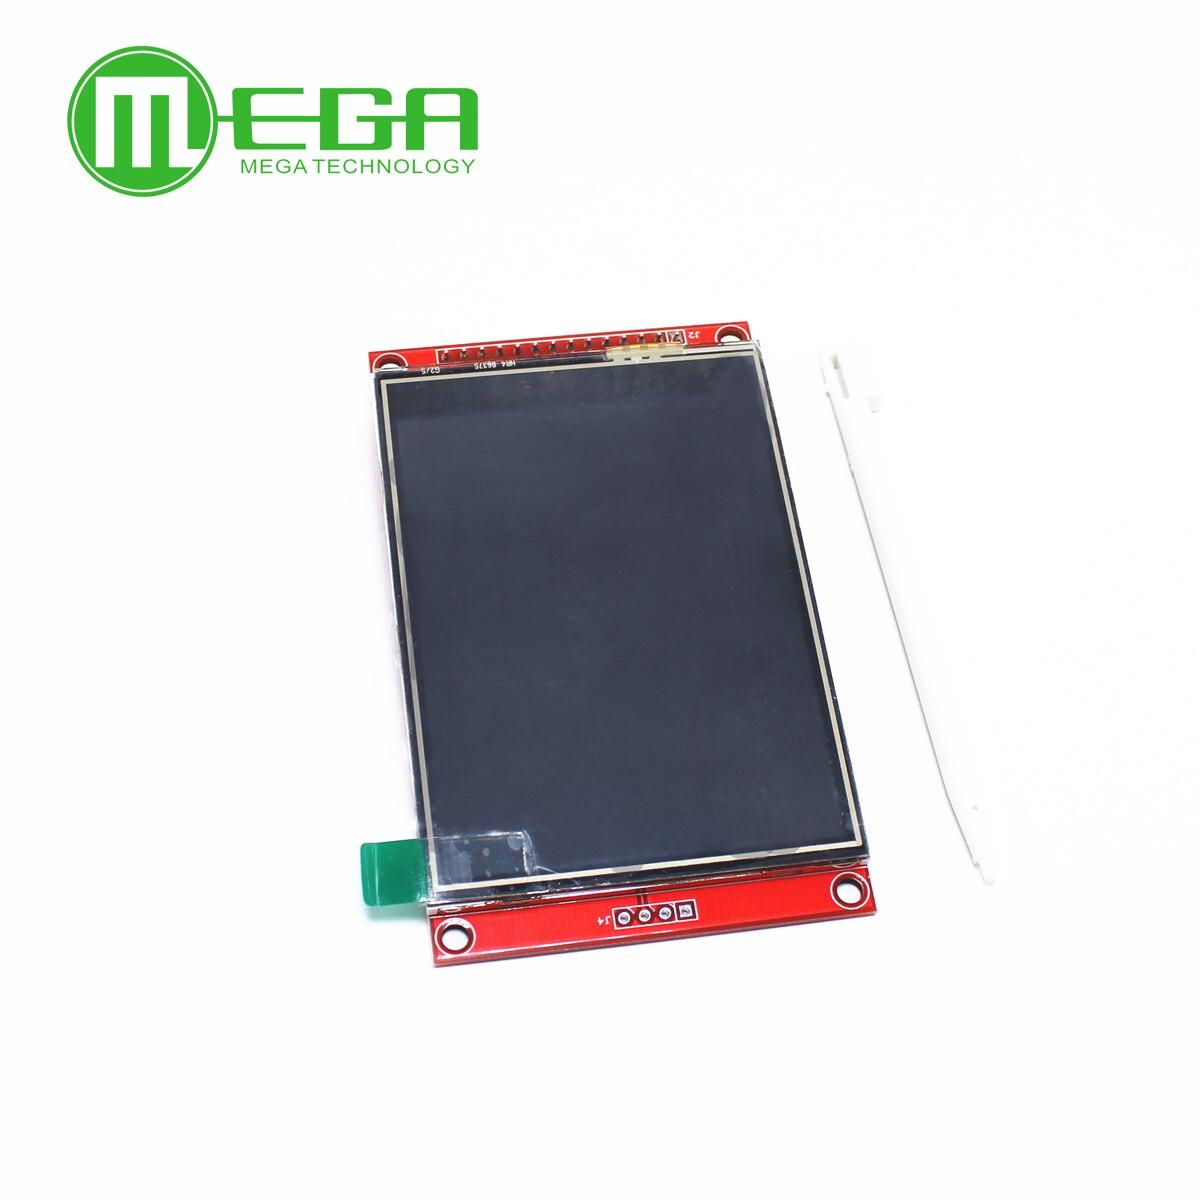 1 pcs 3.2 polegada 320*240 SPI Série TFT Módulo LCD Screen Display com Touch Panel Driver IC ILI9341 para Arduino MCU